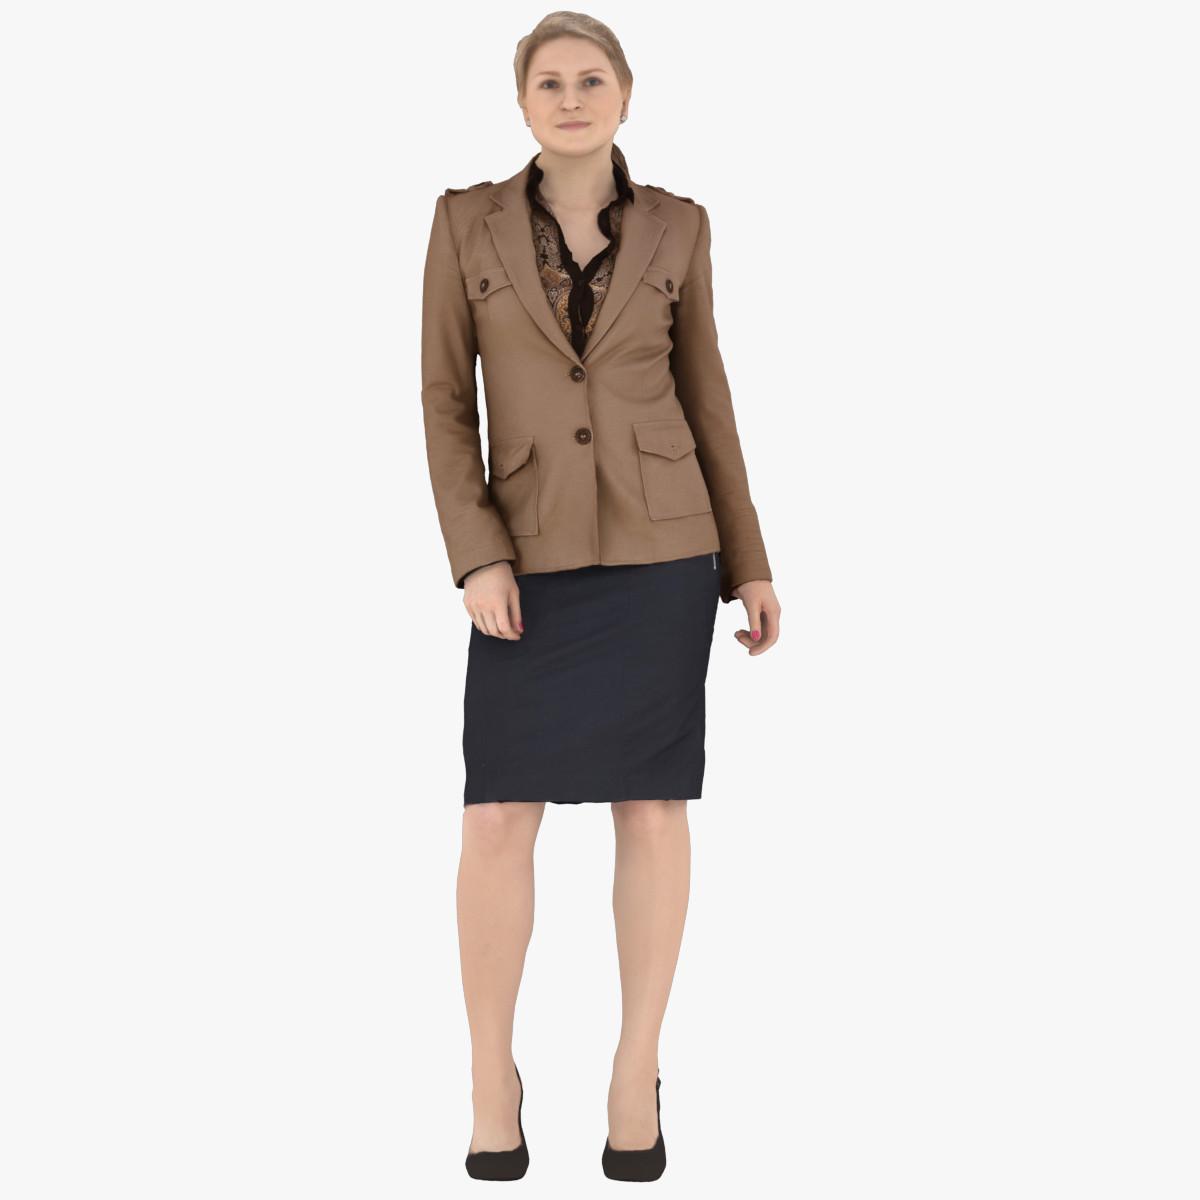 Businesswoman 12